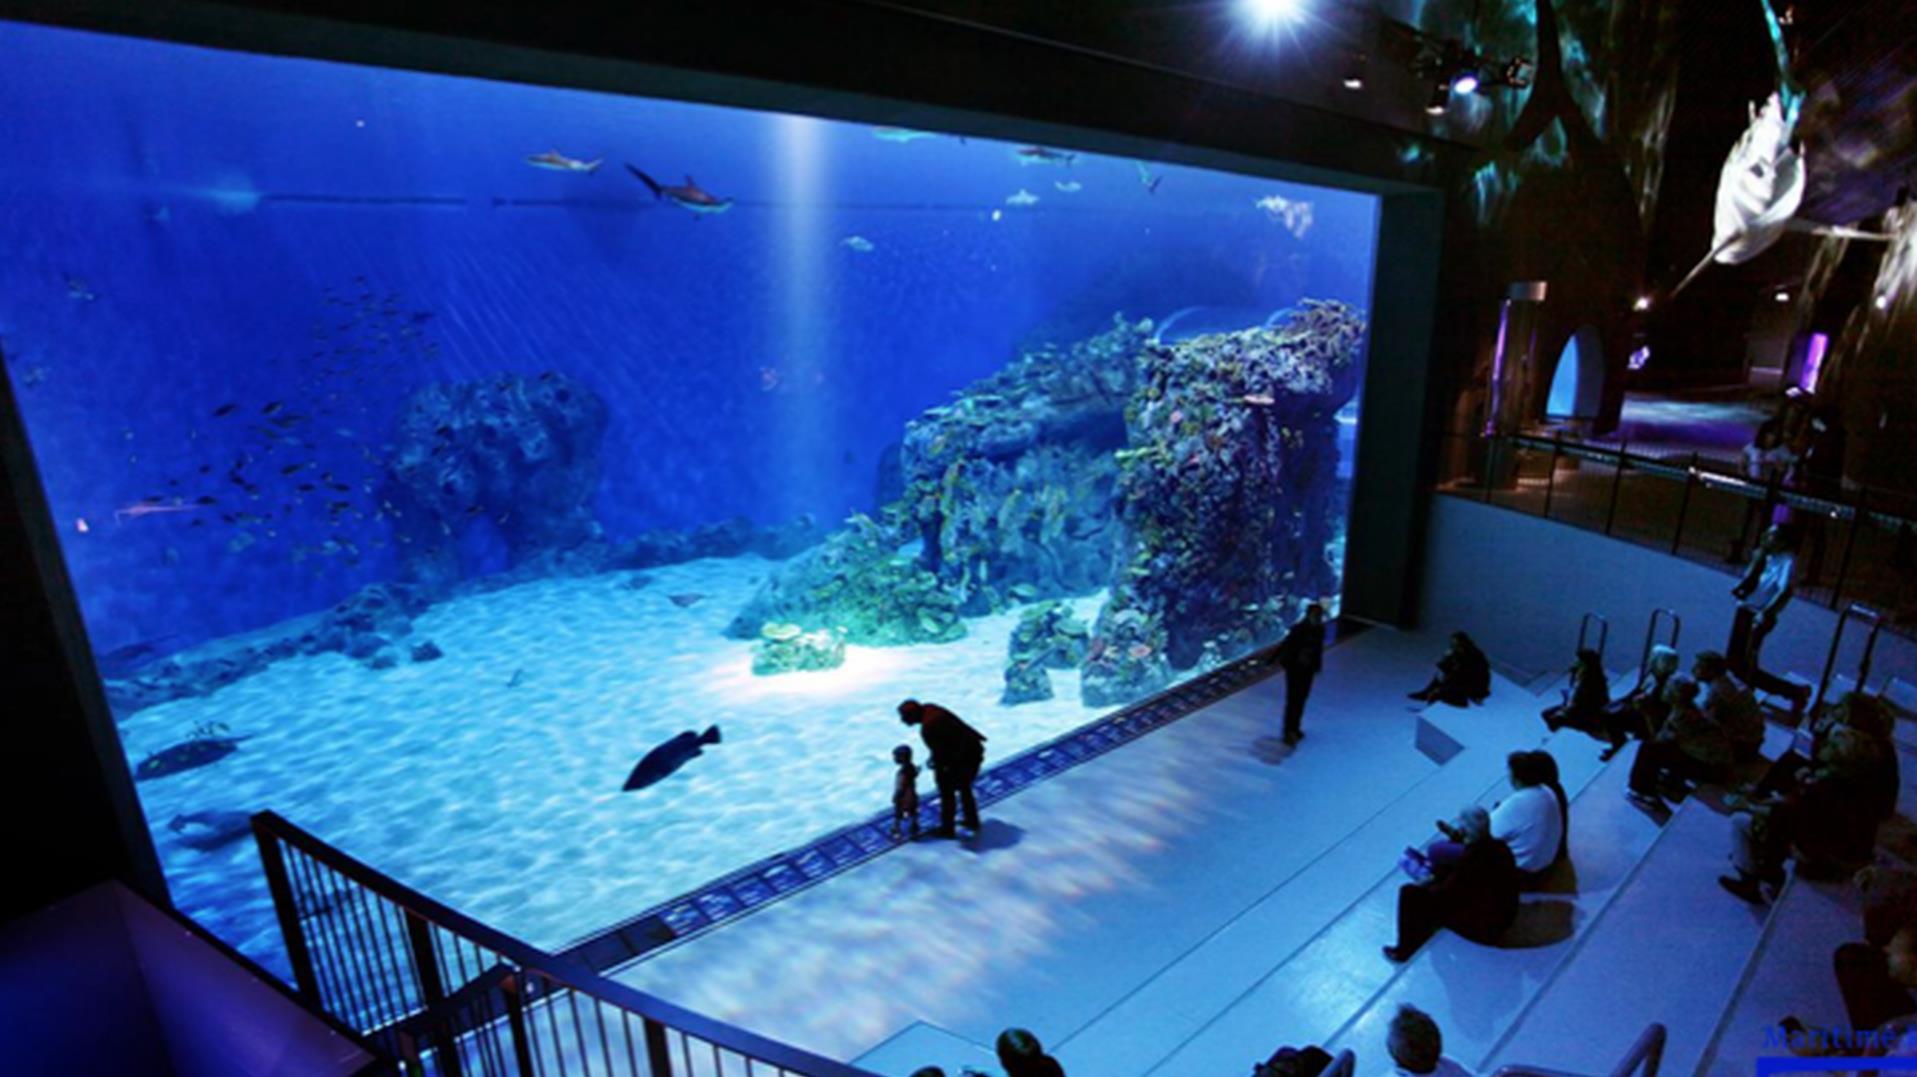 u0026#39;Wrak Kogge bij Kampen in aquarium onder water u0026#39;